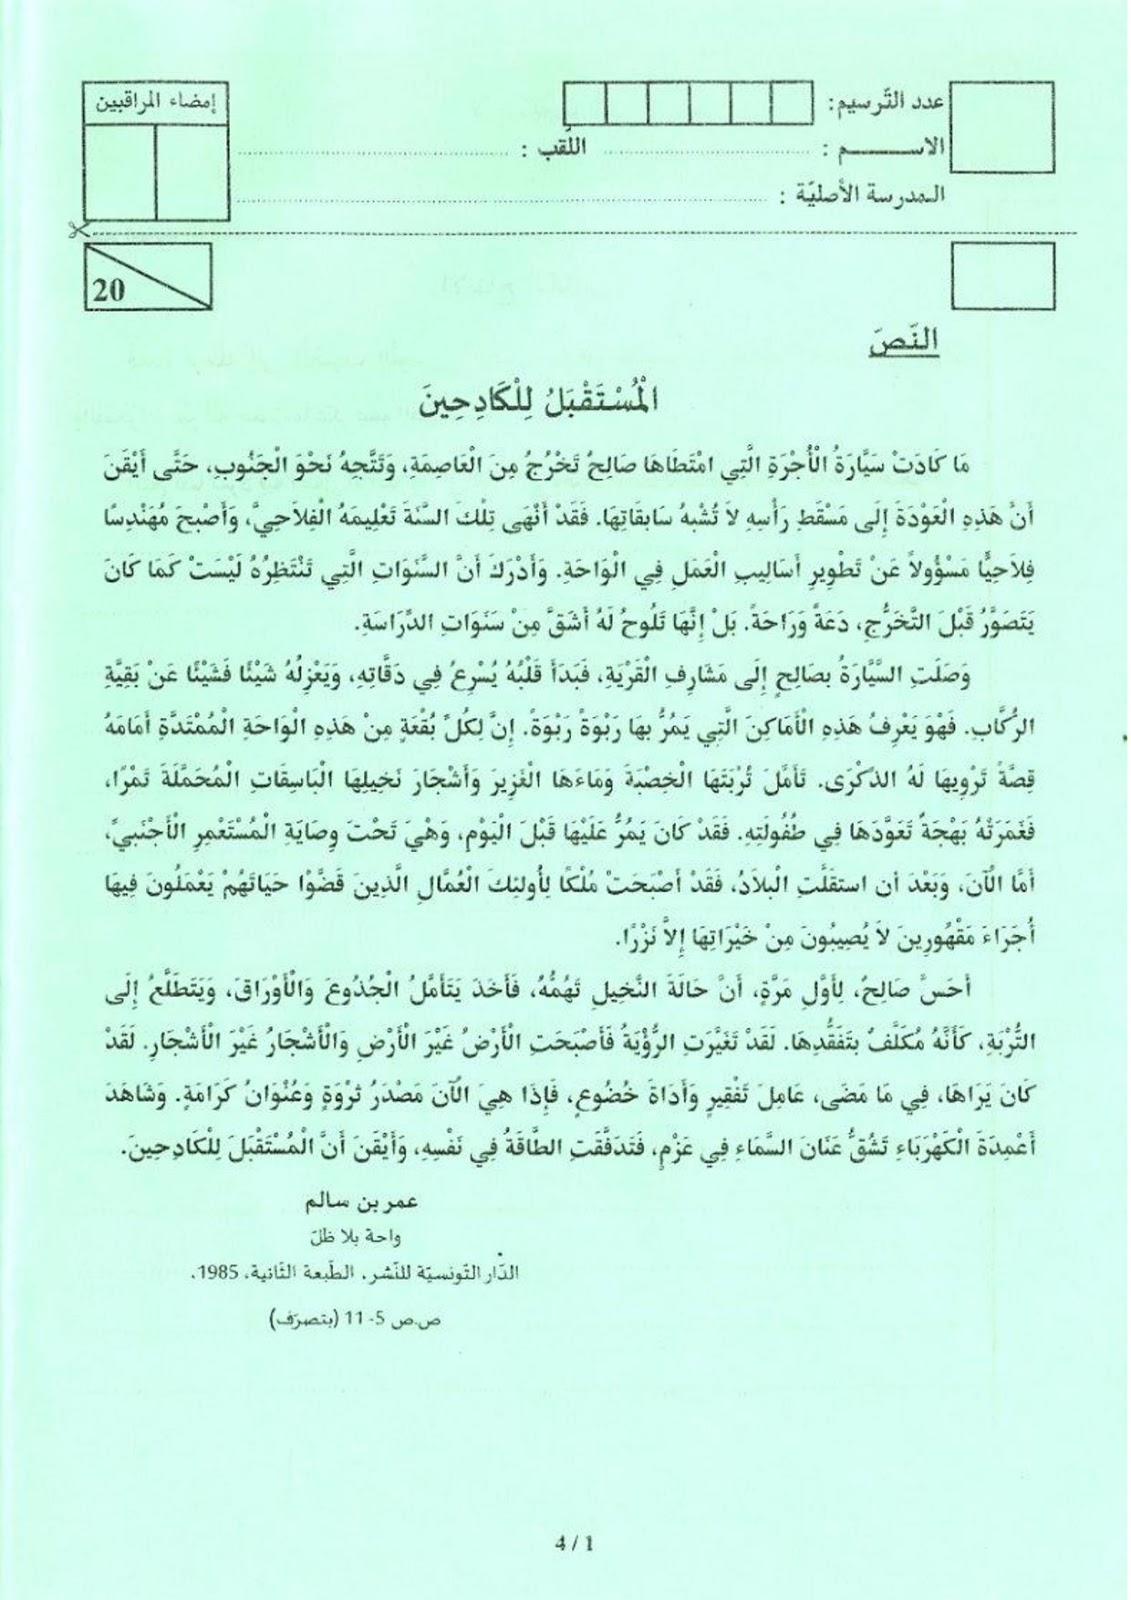 arabe page 001 - إختبارات اليوم الأول مع الإصلاح سيزيام 2018 عربية و انجليزية